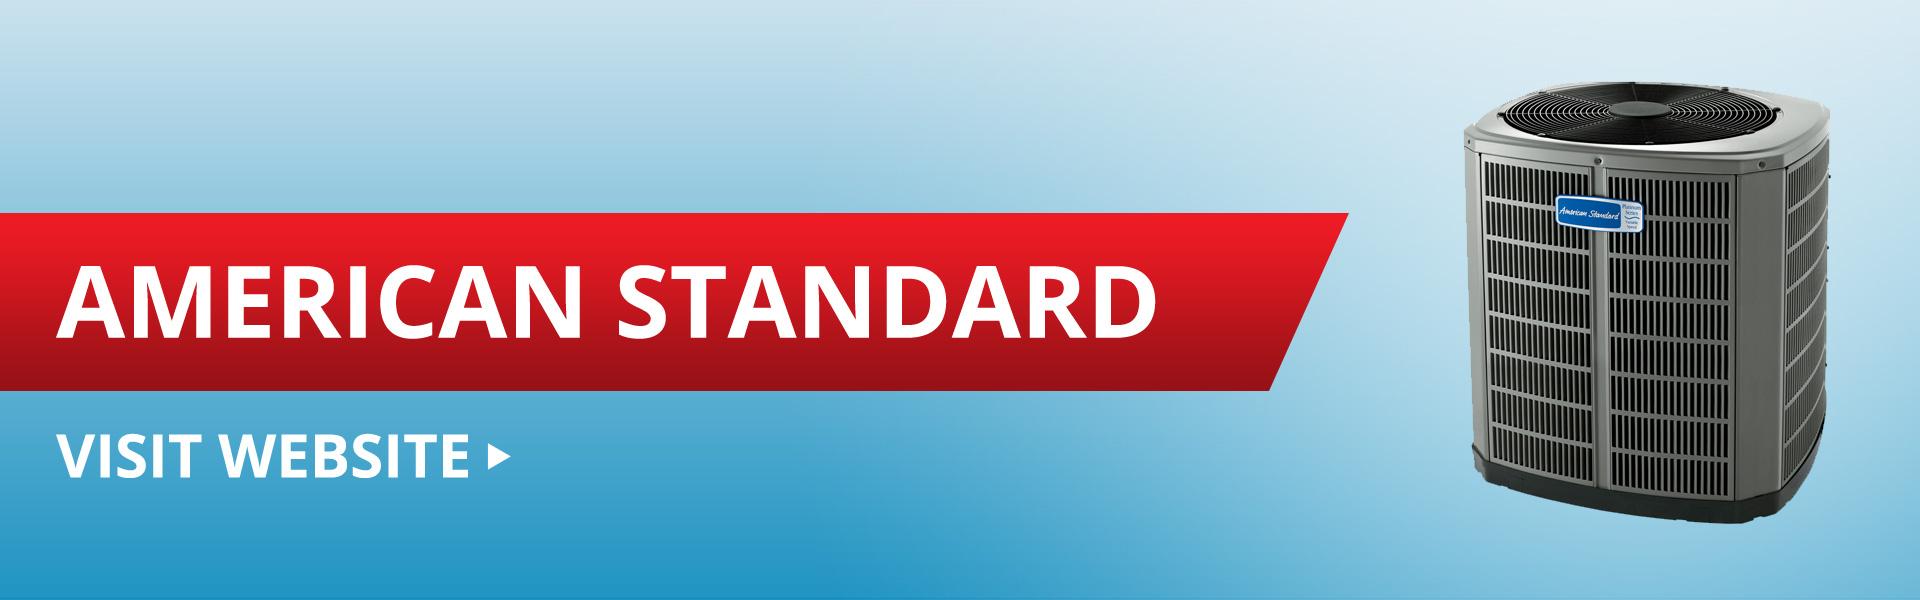 Visit the American Standard website